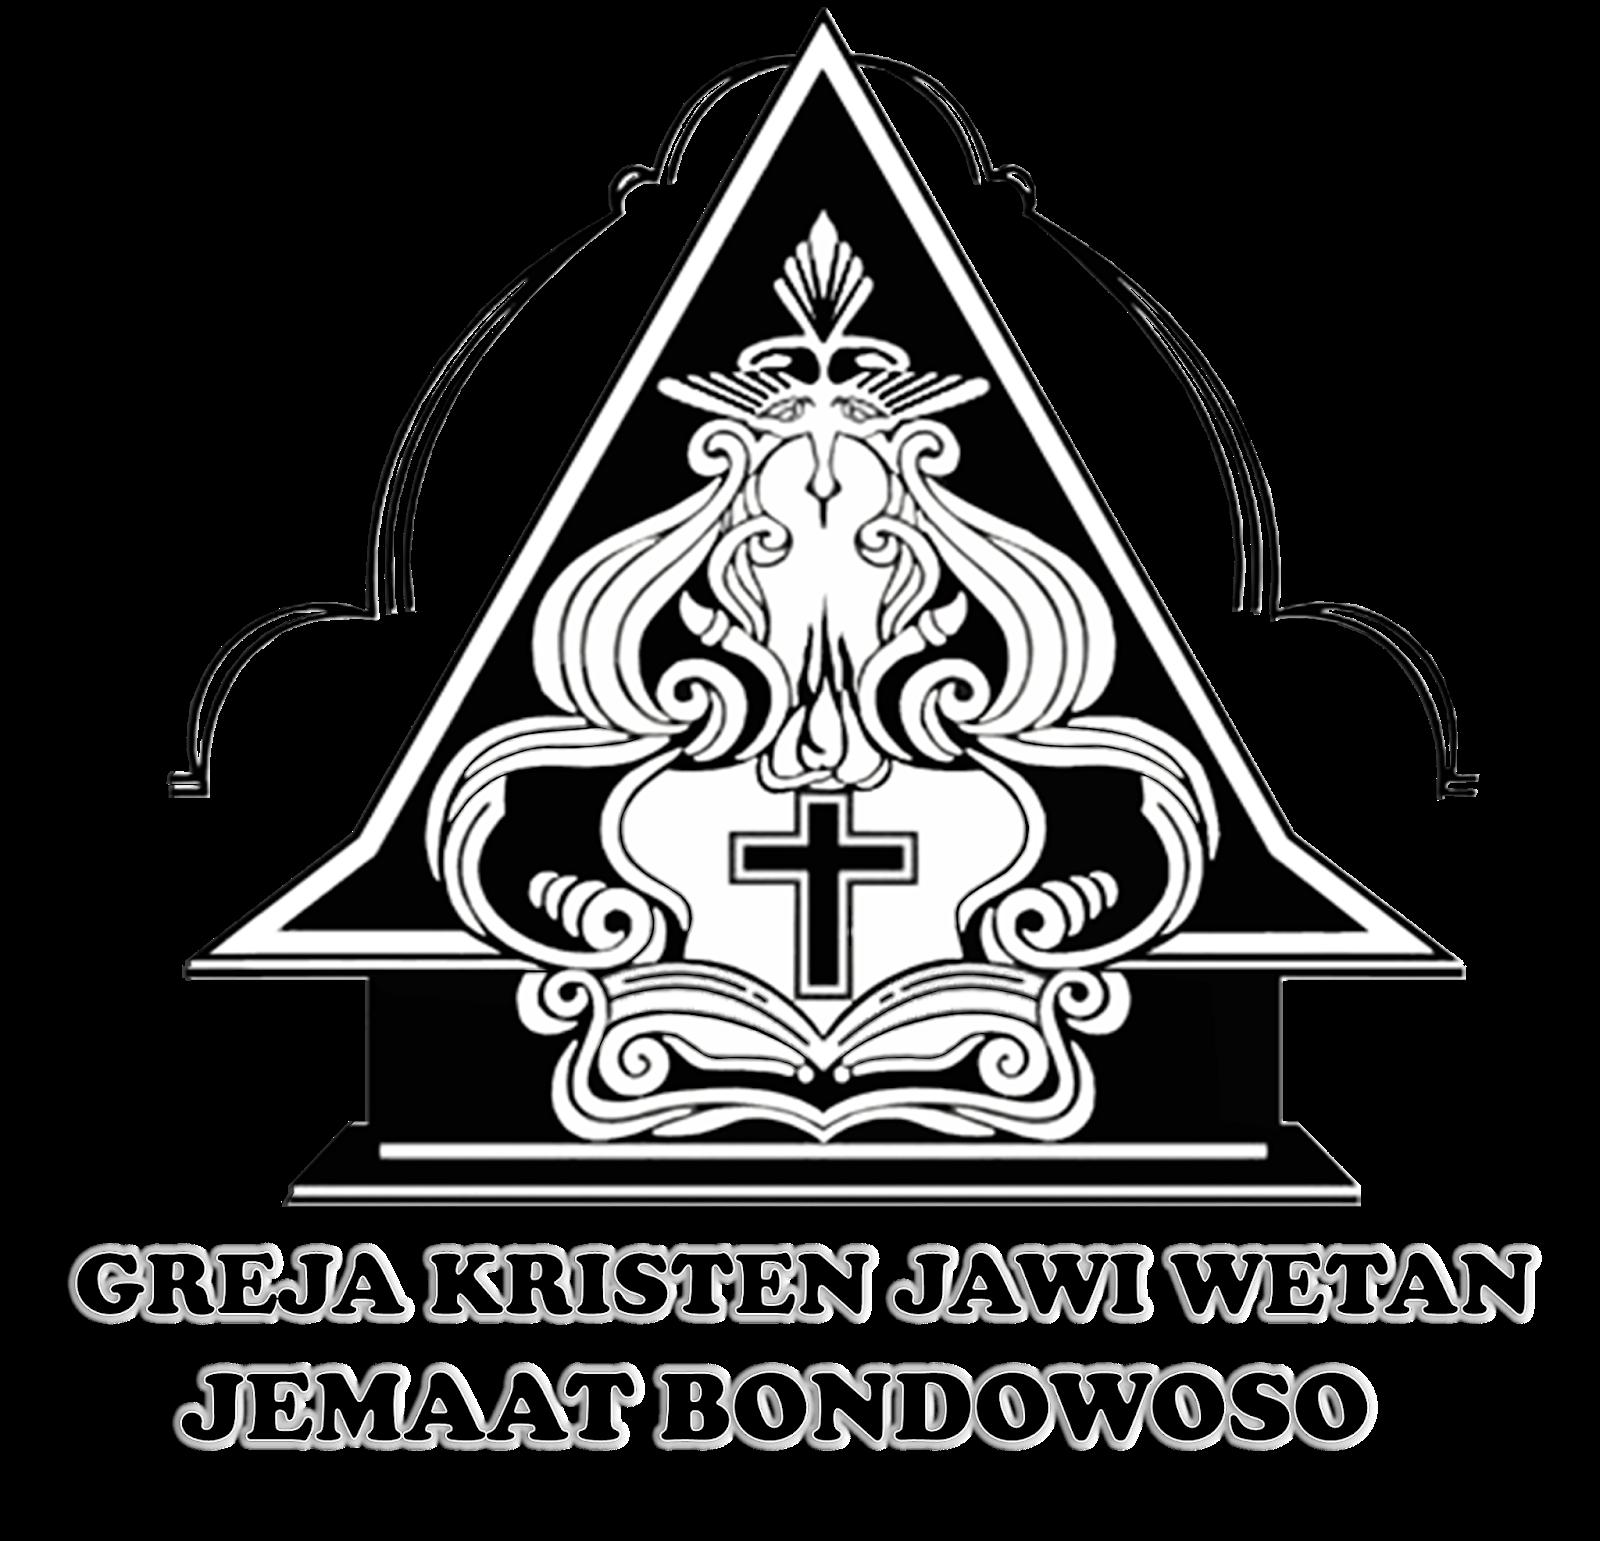 Gambar Gambar Gkjw Bondowoso